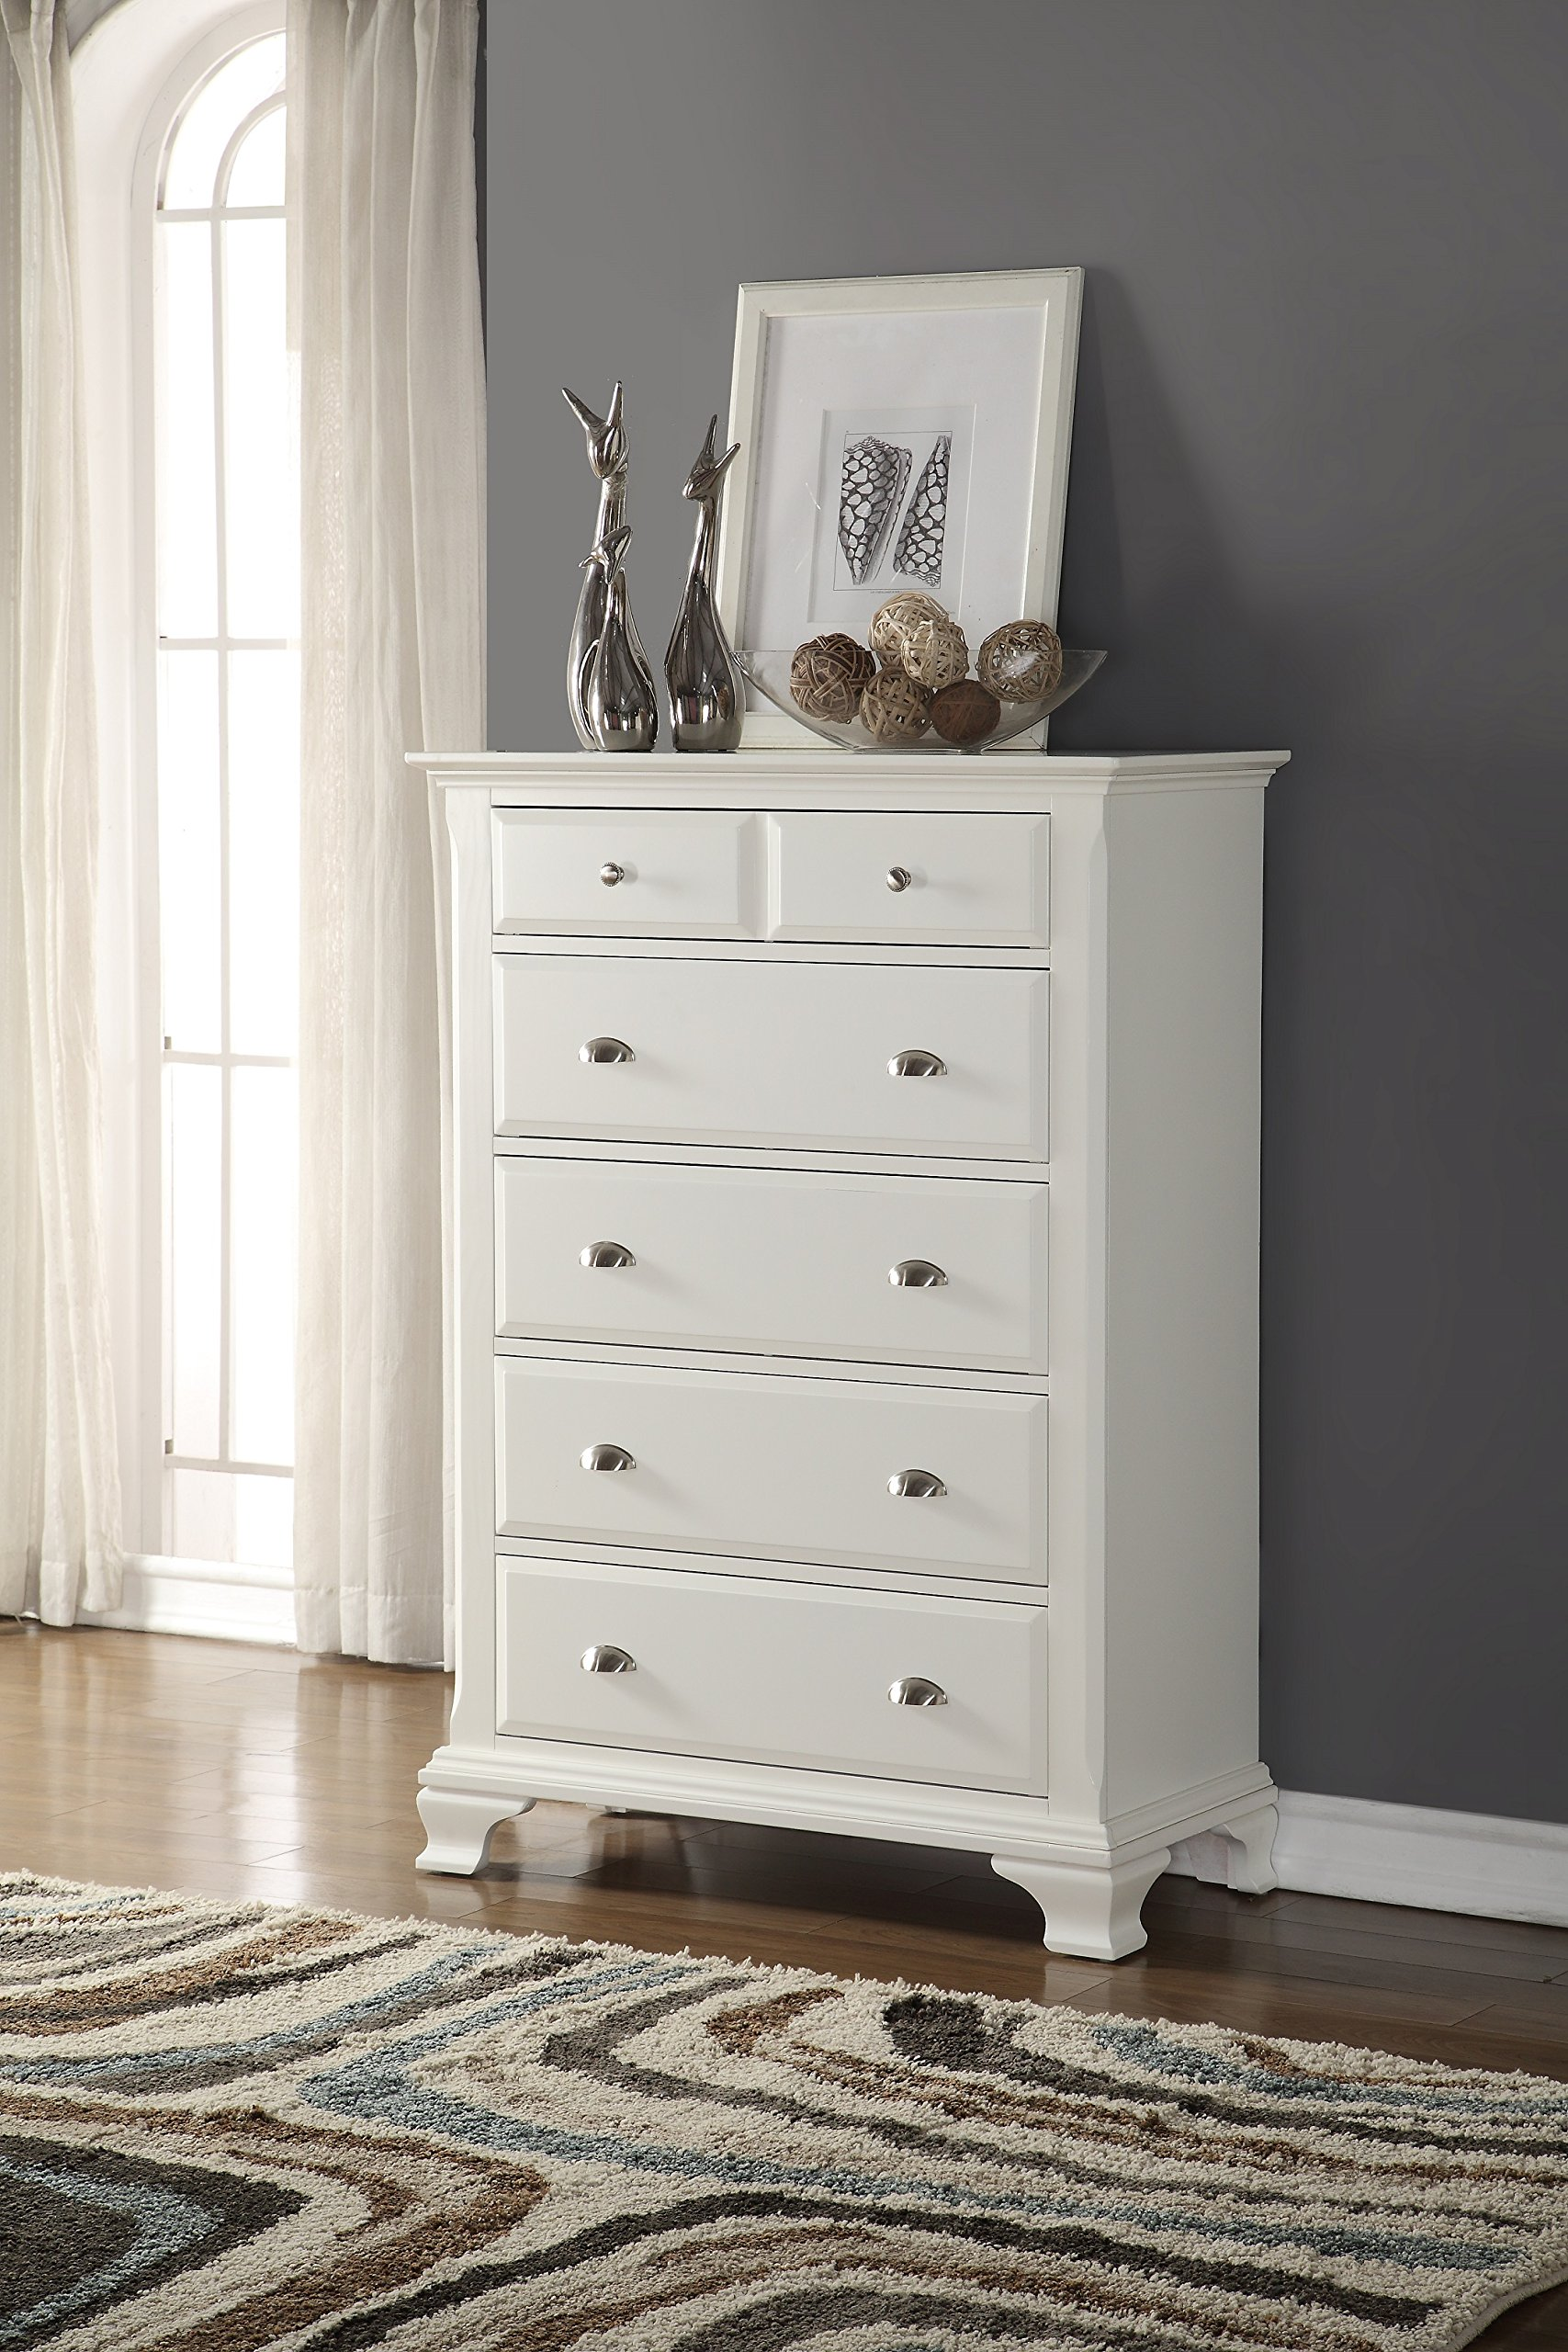 Roundhill Furniture B012C Laveno Wood 5-Drawer Chest, White